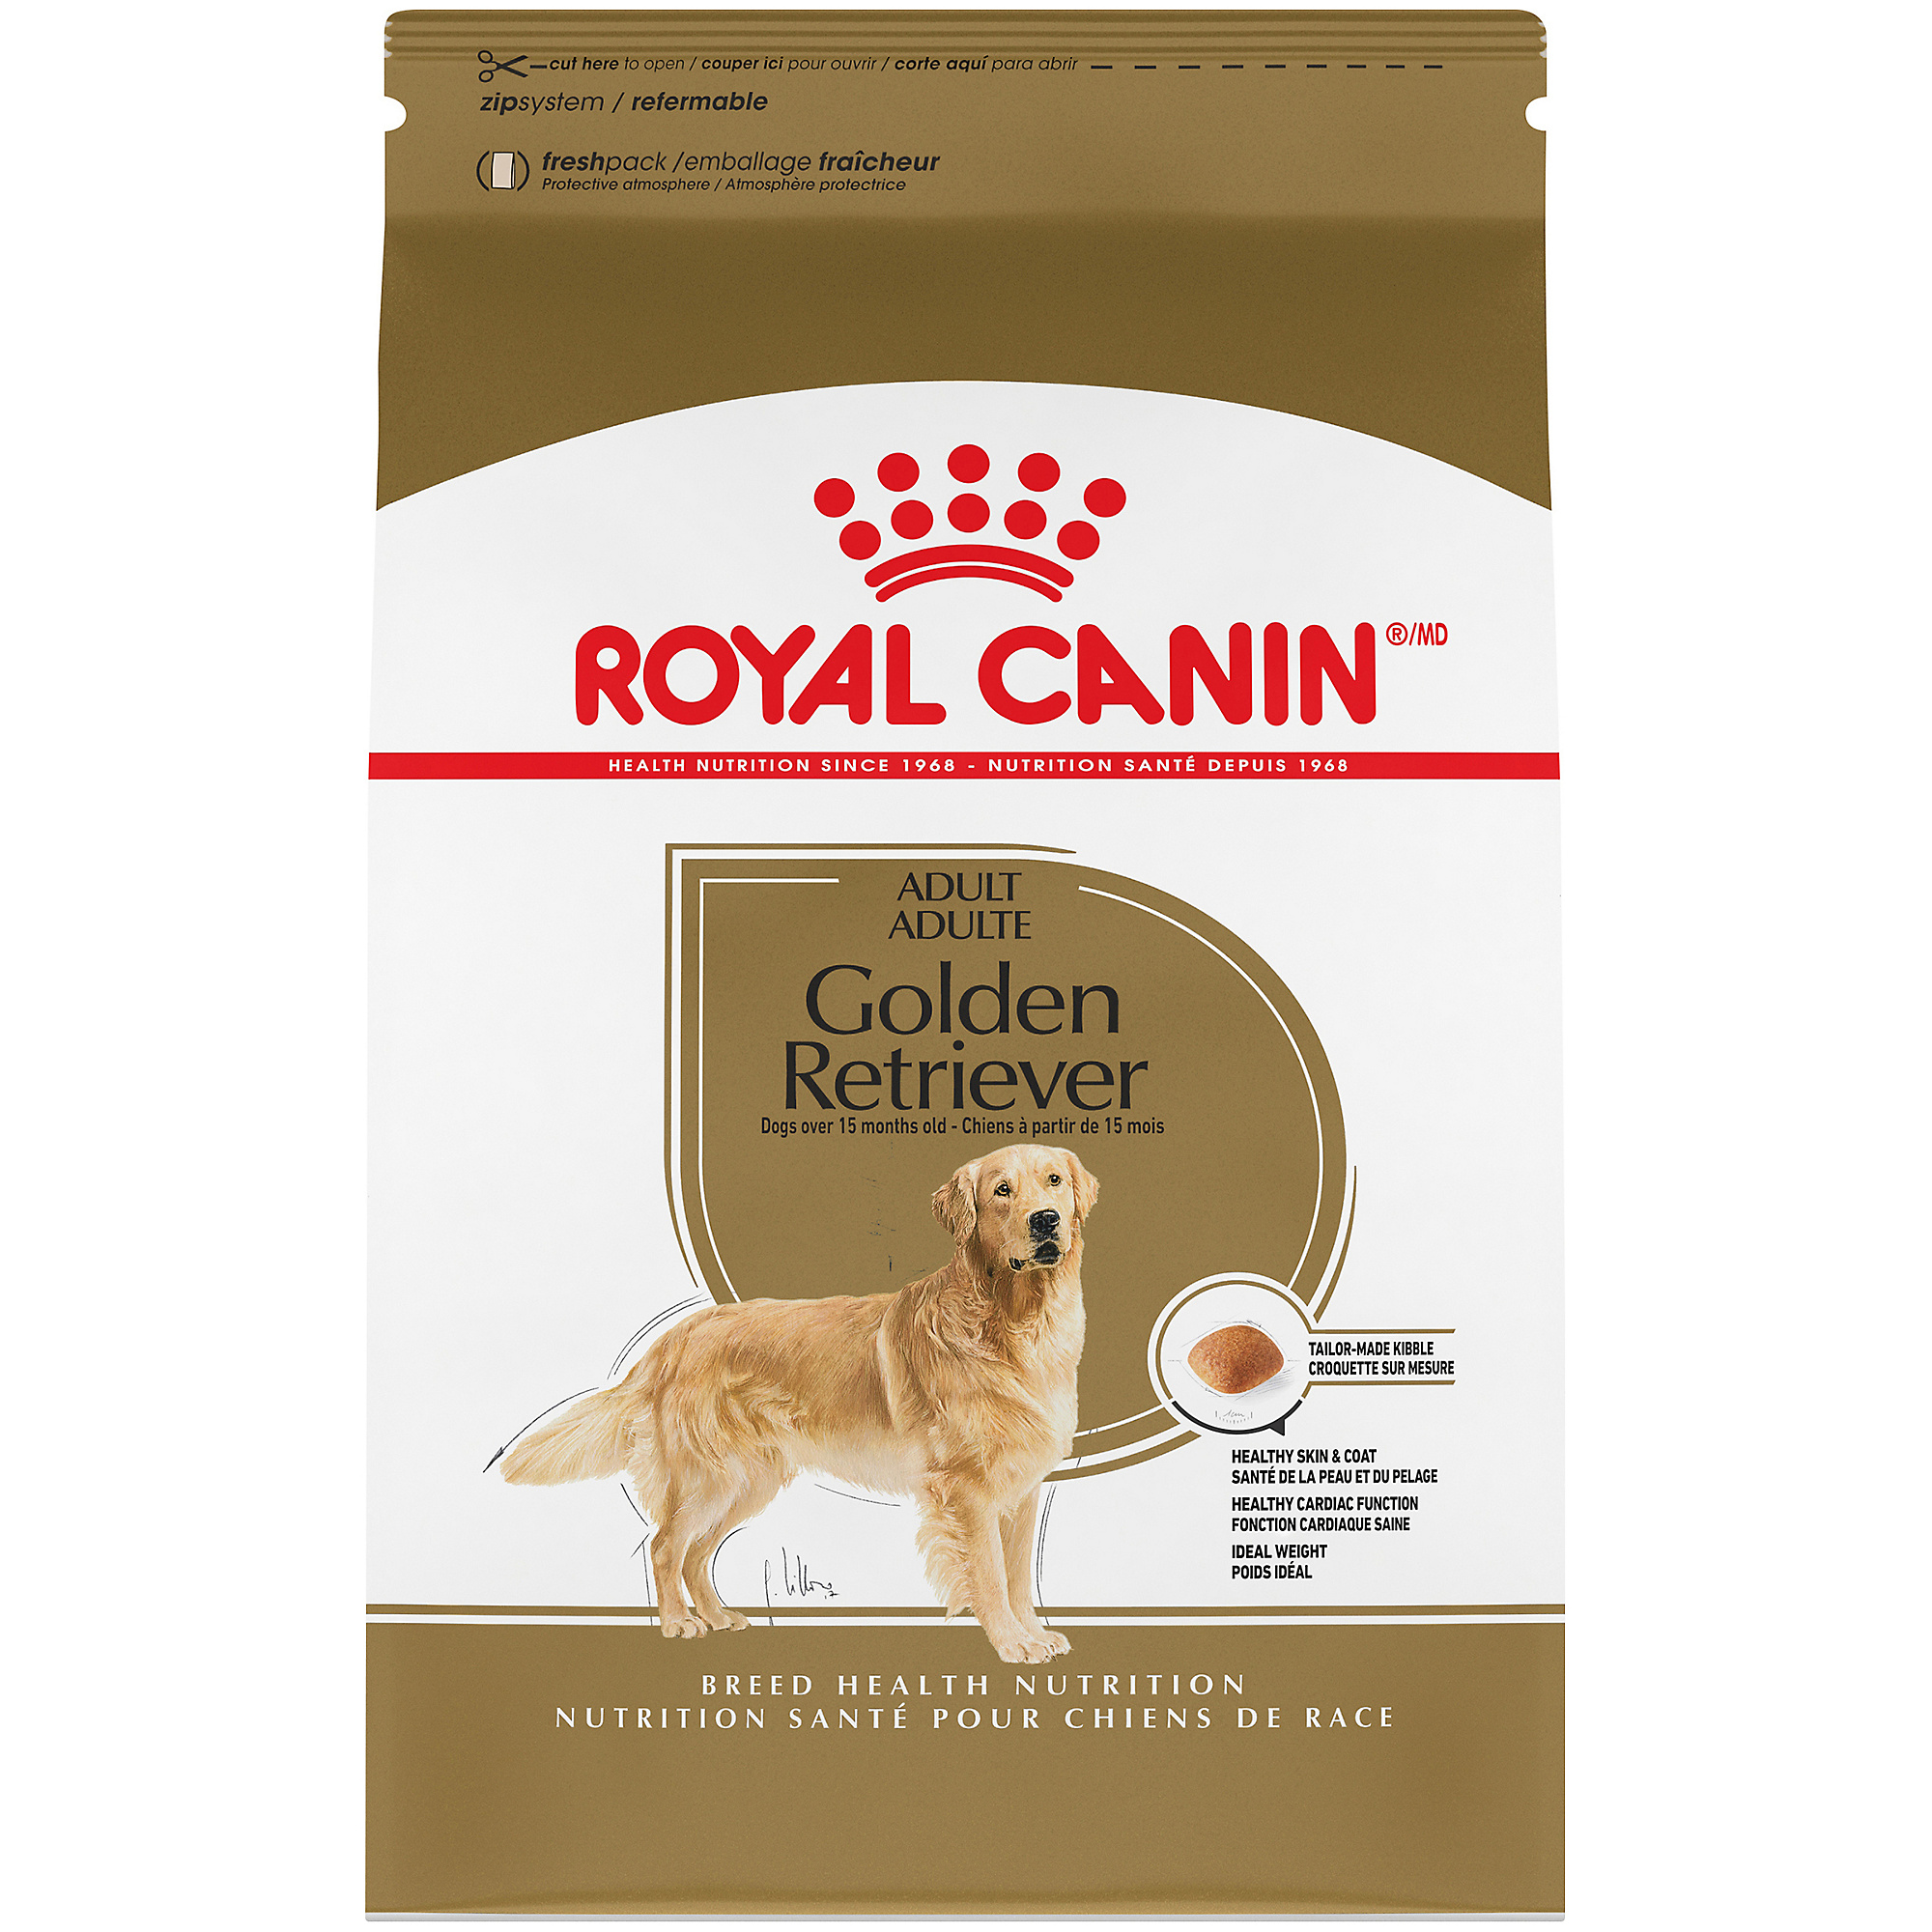 Golden Retriever Adult Dry Dog Food